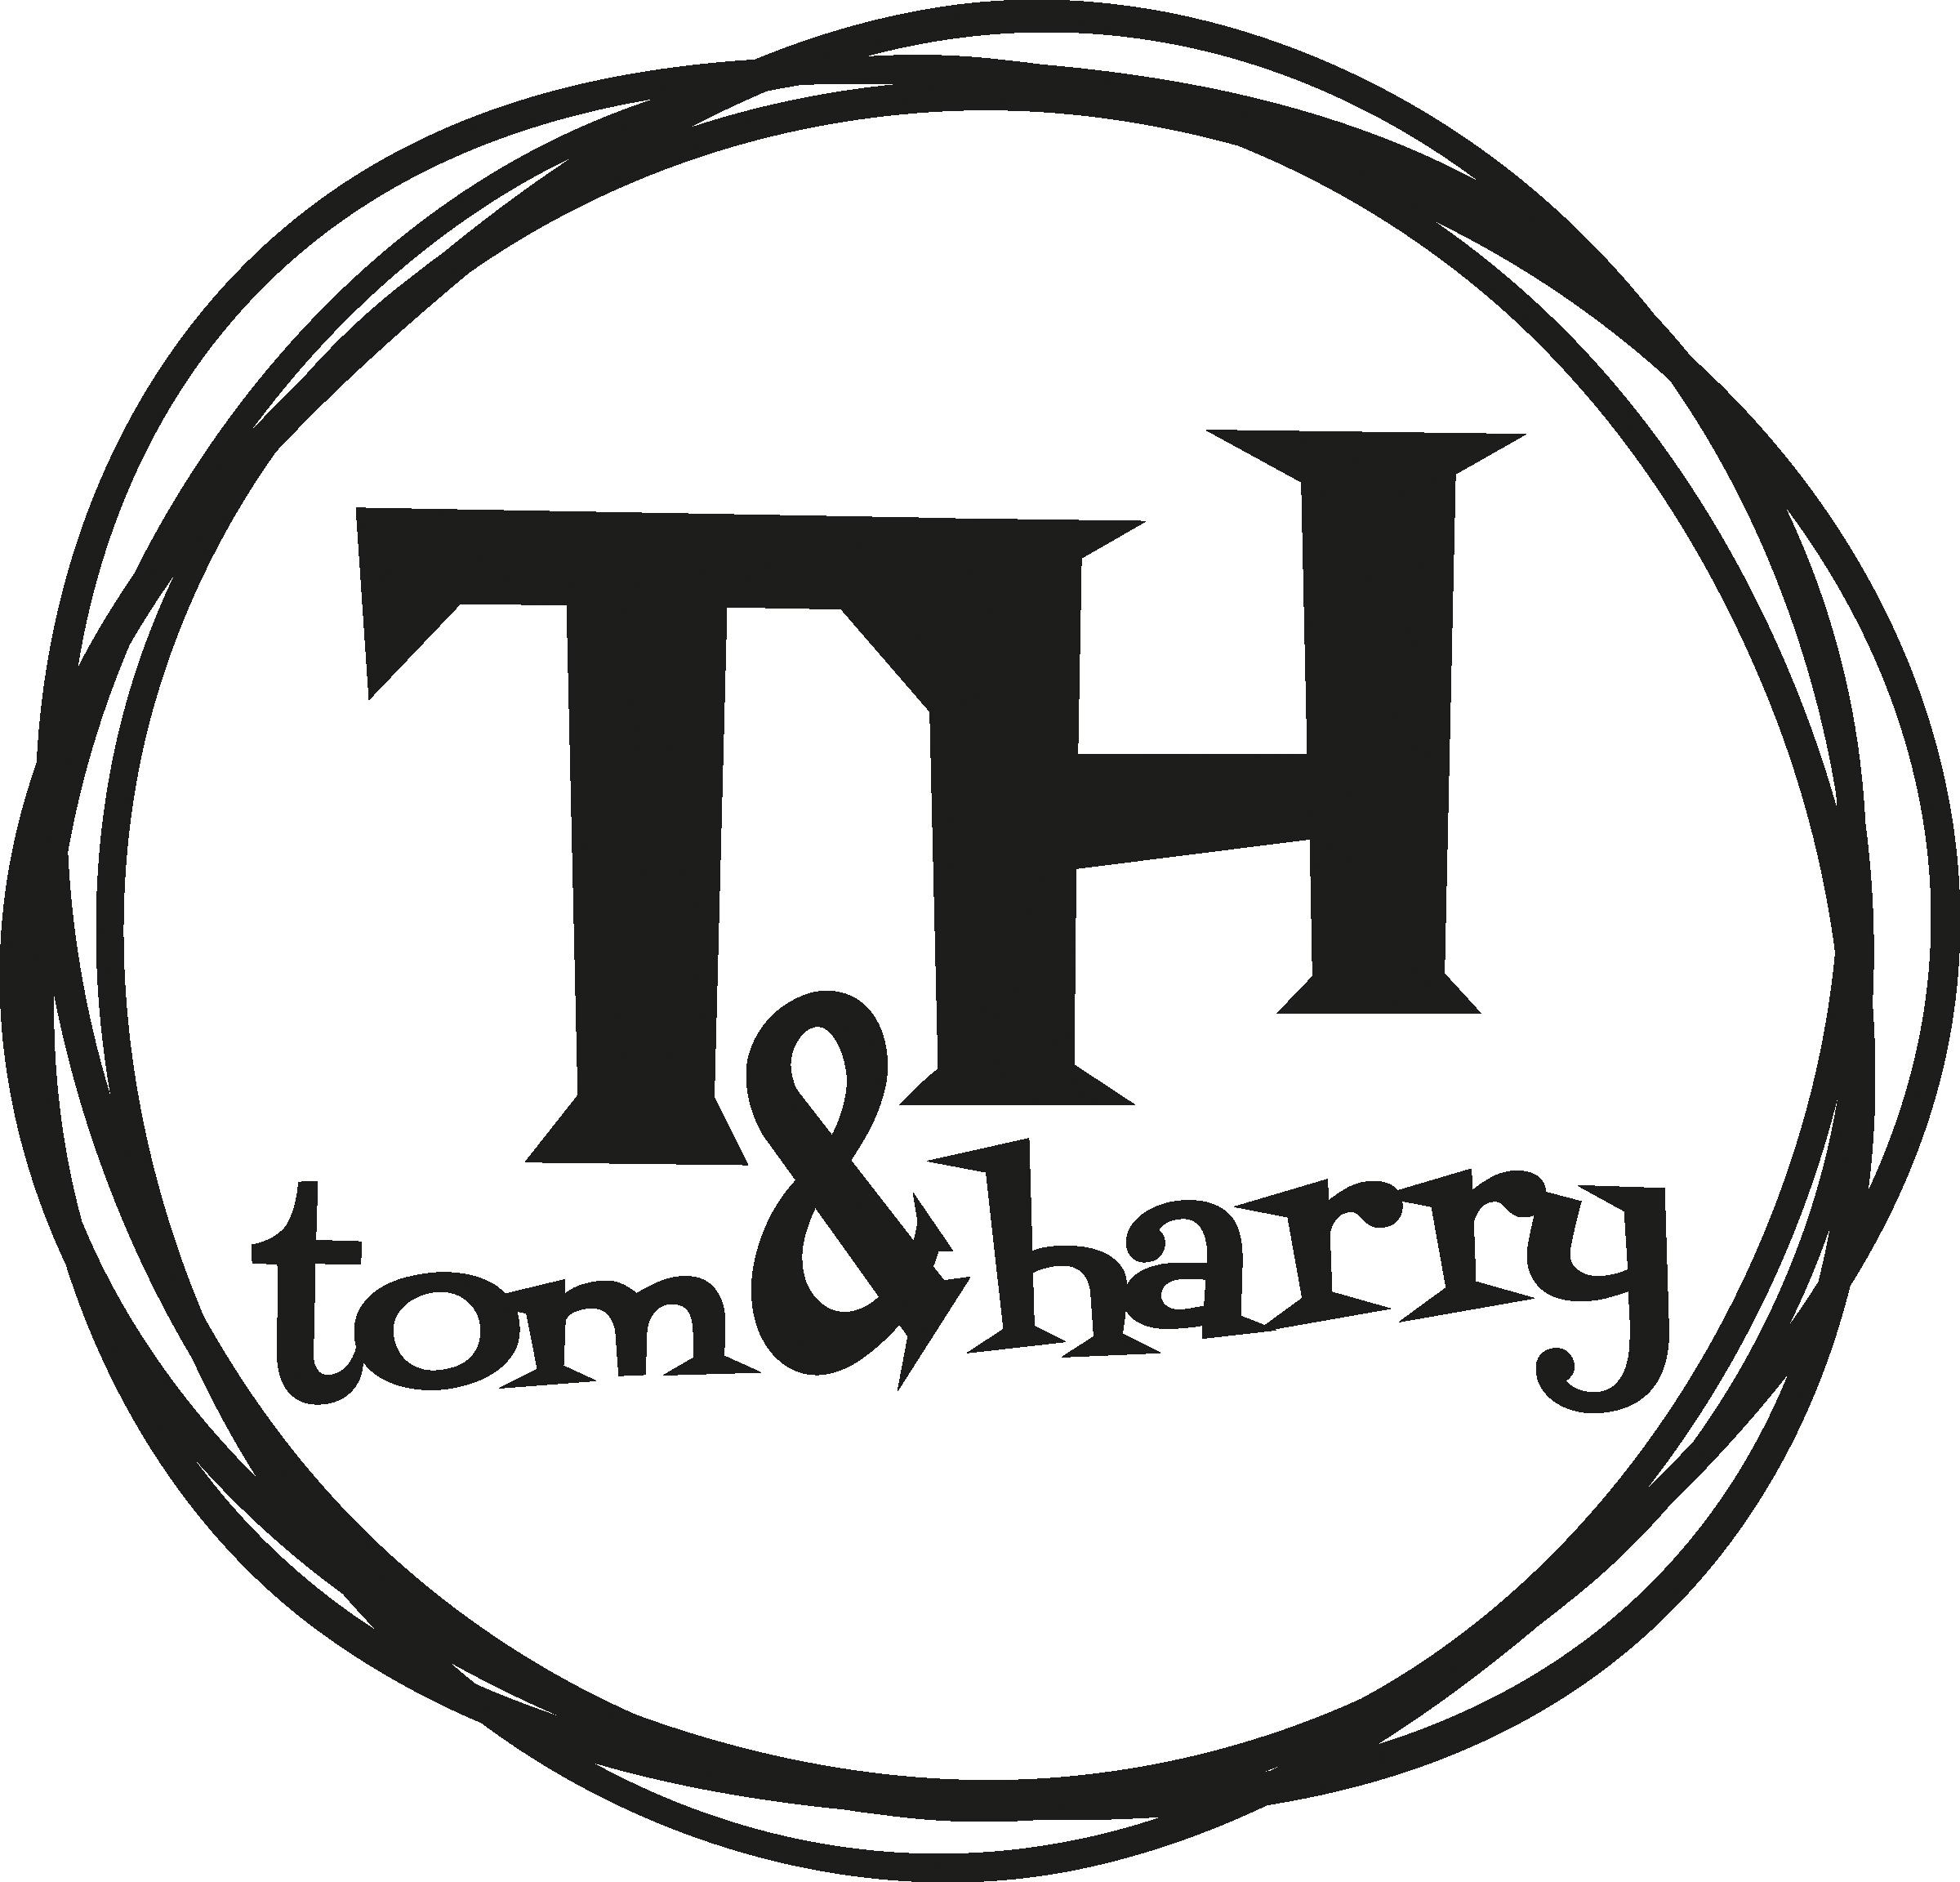 Logo Tom&Harry